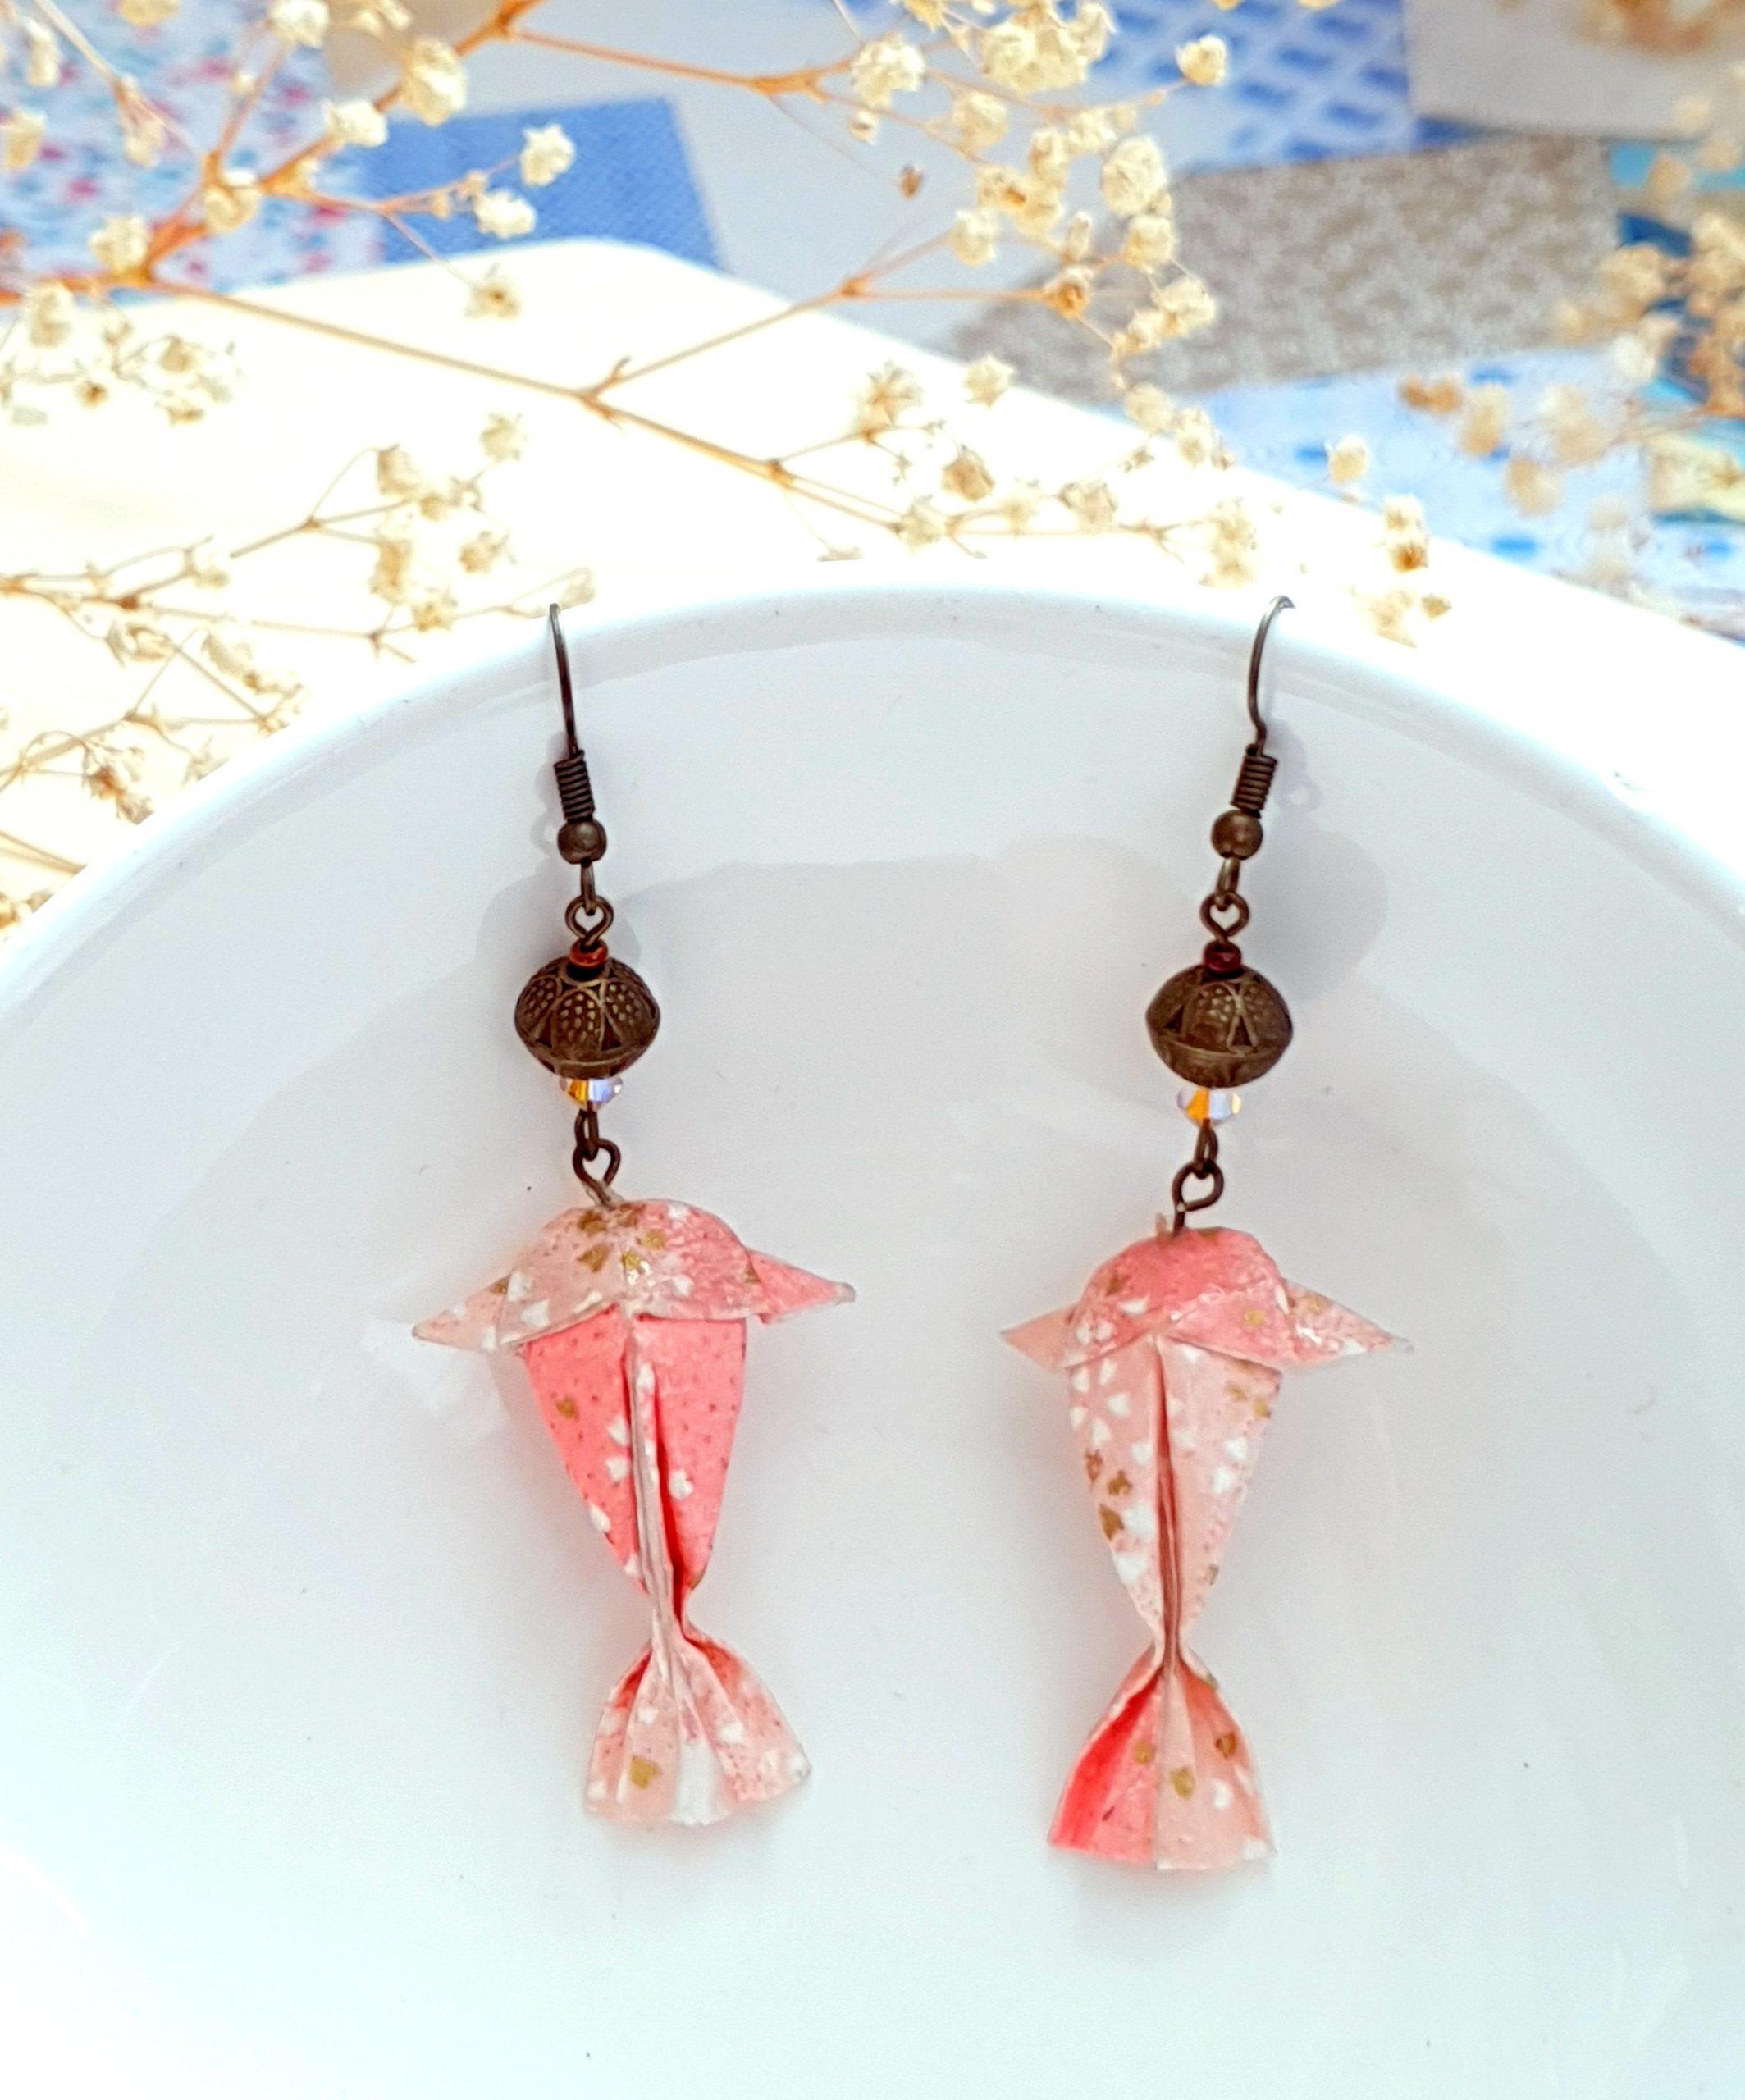 Boucles d'oreilles origami carpe koï rose et perle swarovski, métal bronze.